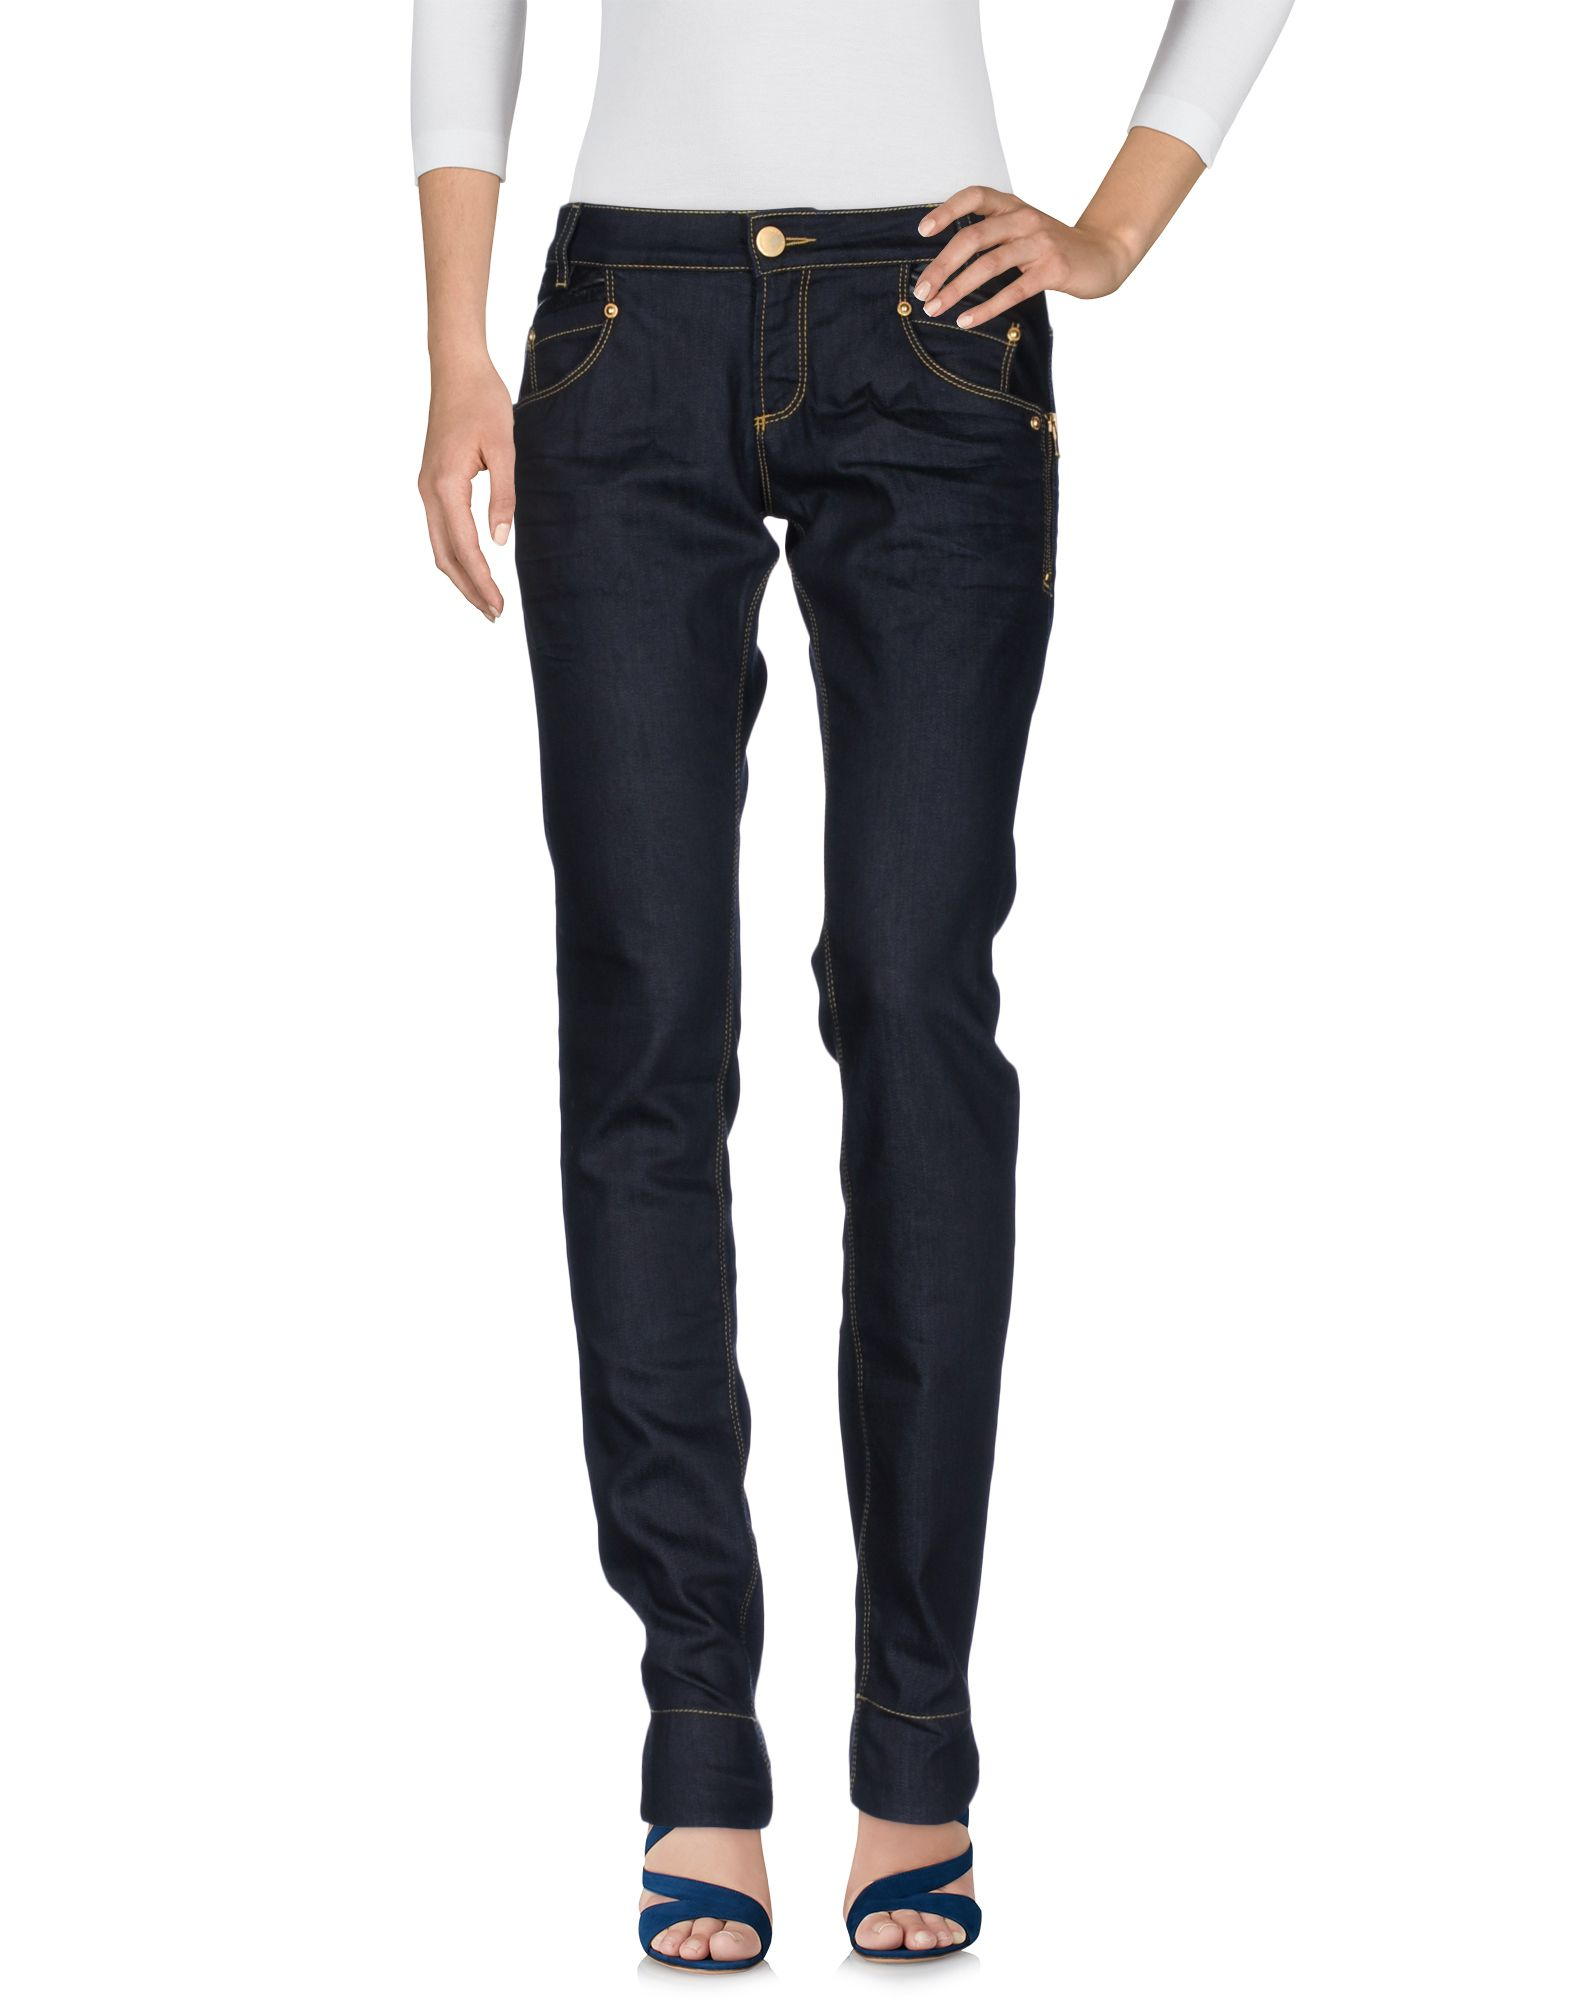 Pantaloni Jeans Pinko Donna - Acquista online su